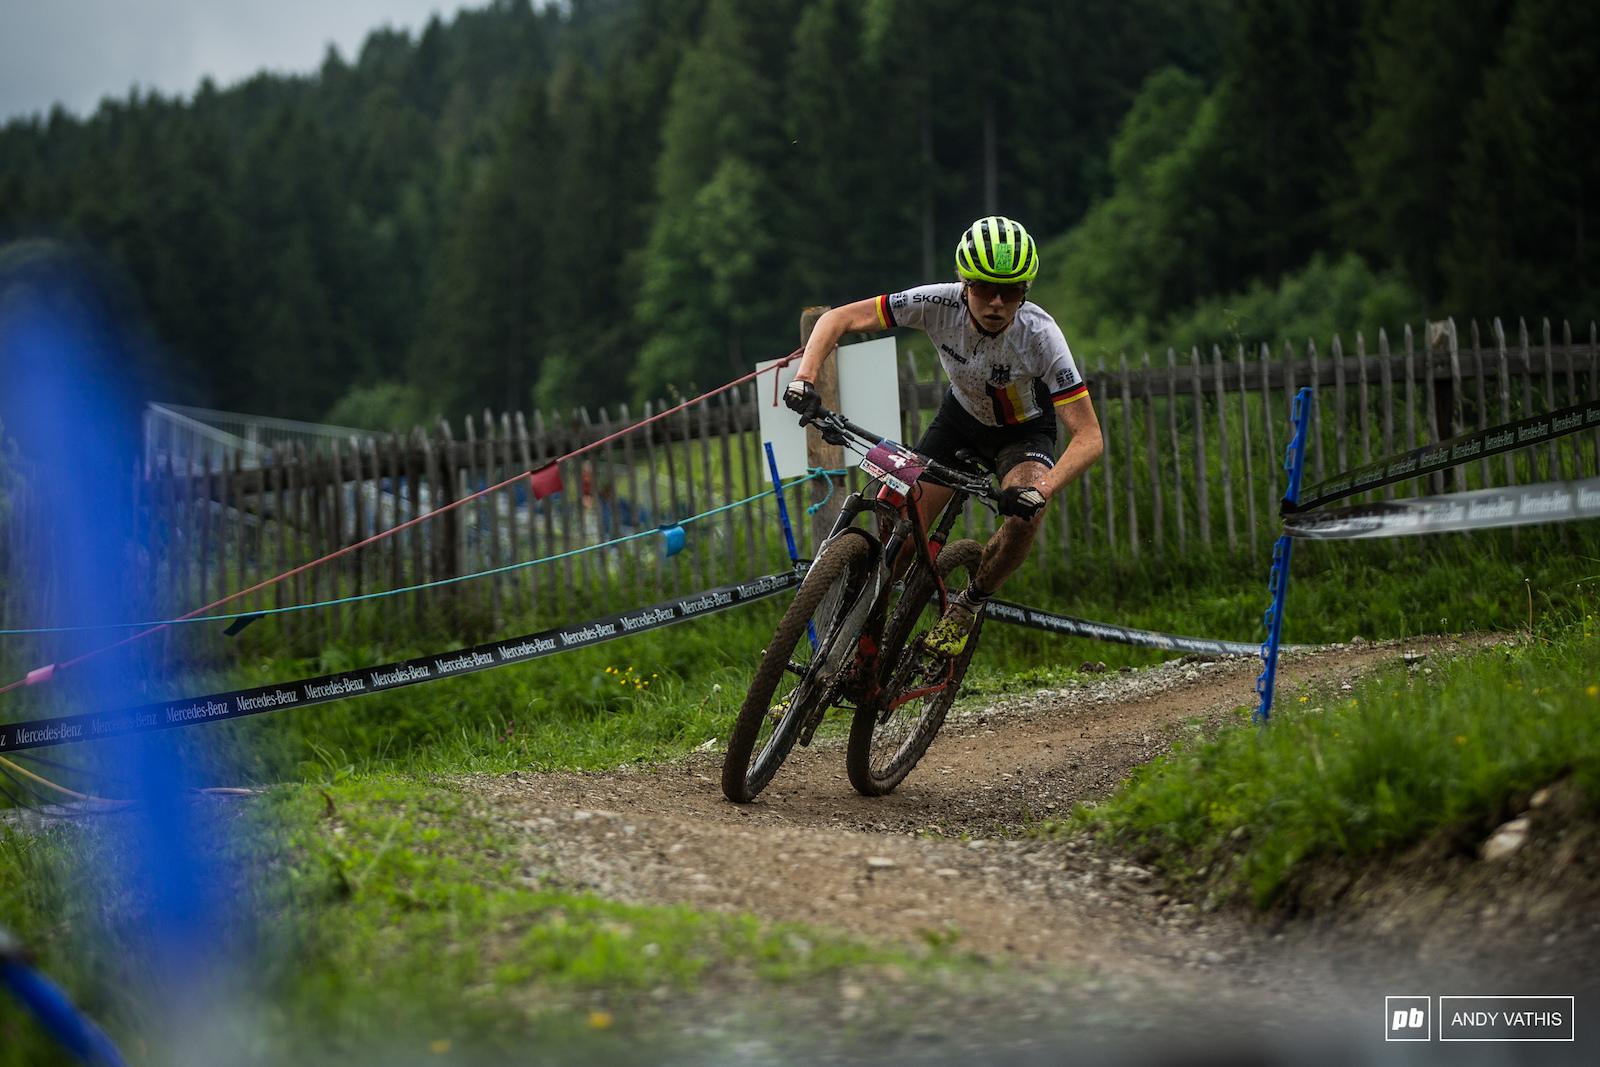 Fifth place for Leonie Daubermann.